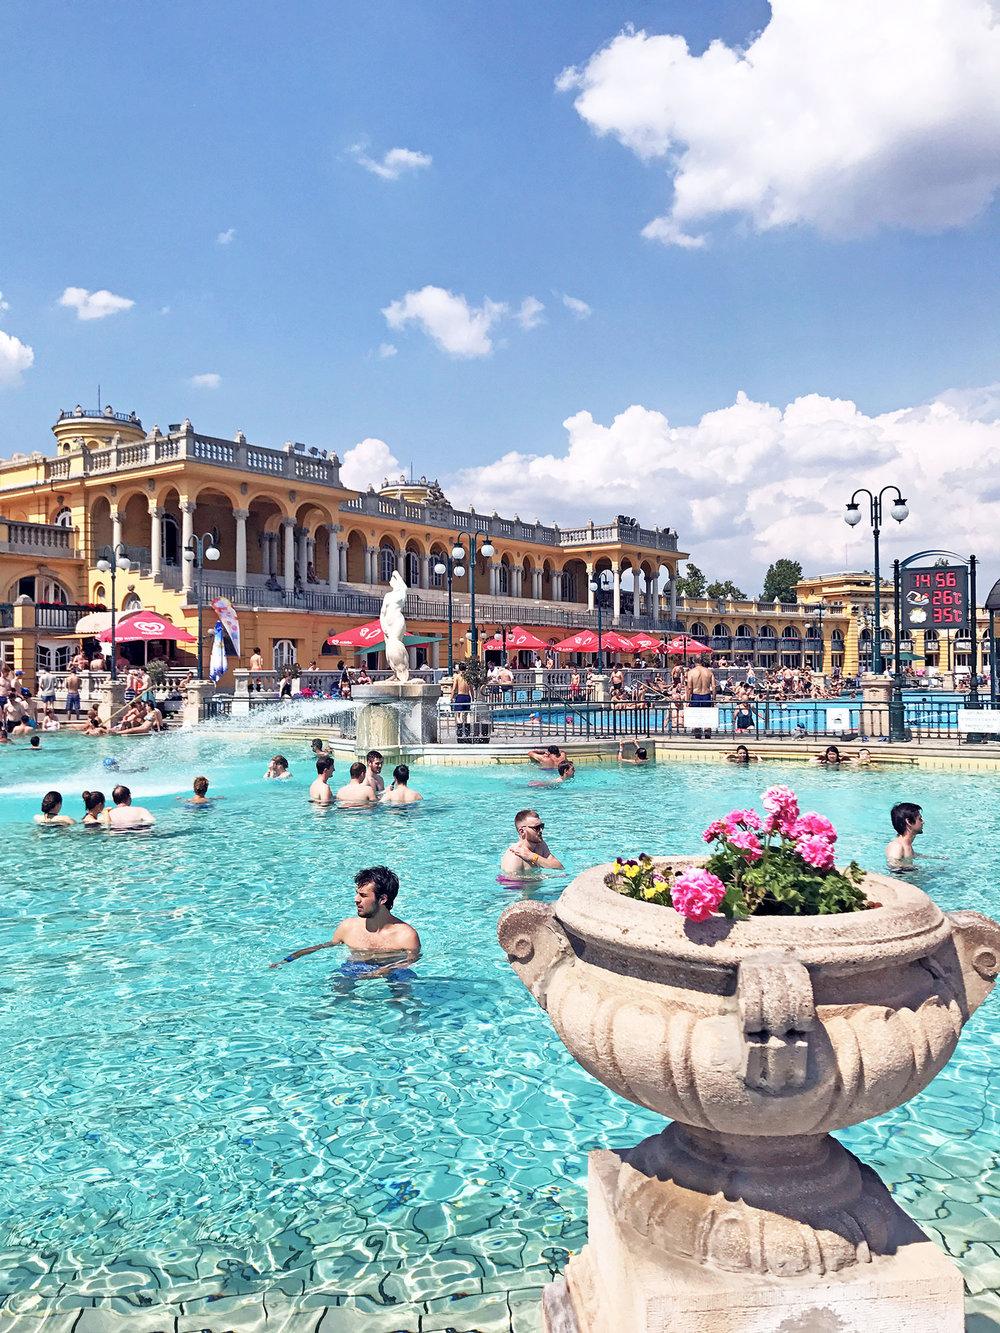 Szechenyi bath Budapest